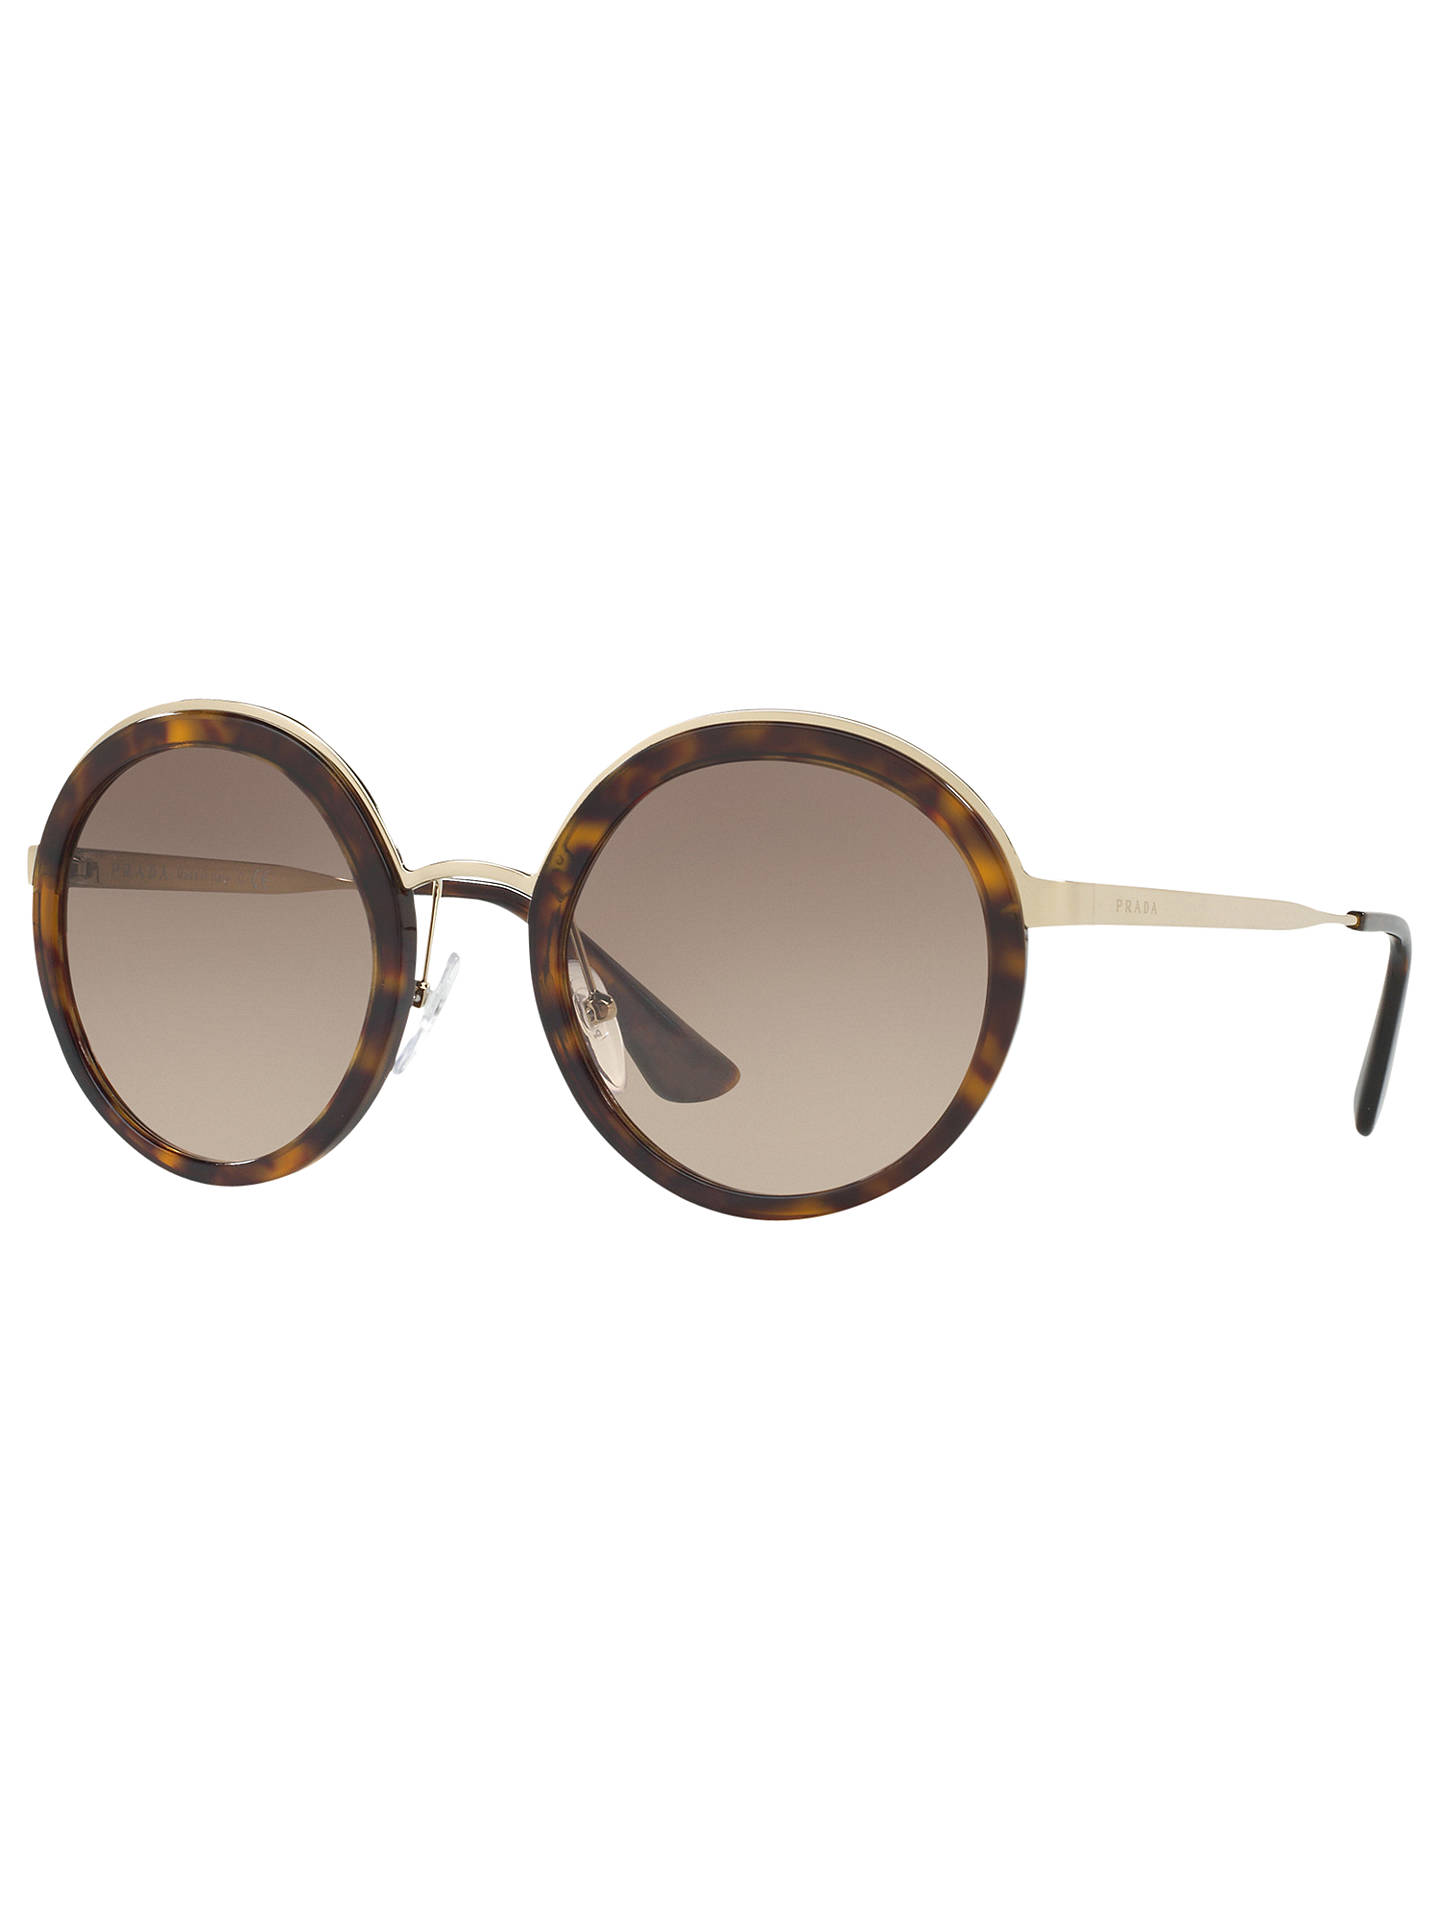 08b7e234751b Buy Prada PR 50TS Round Sunglasses, Tortoise/Brown Gradient Online at  johnlewis.com ...